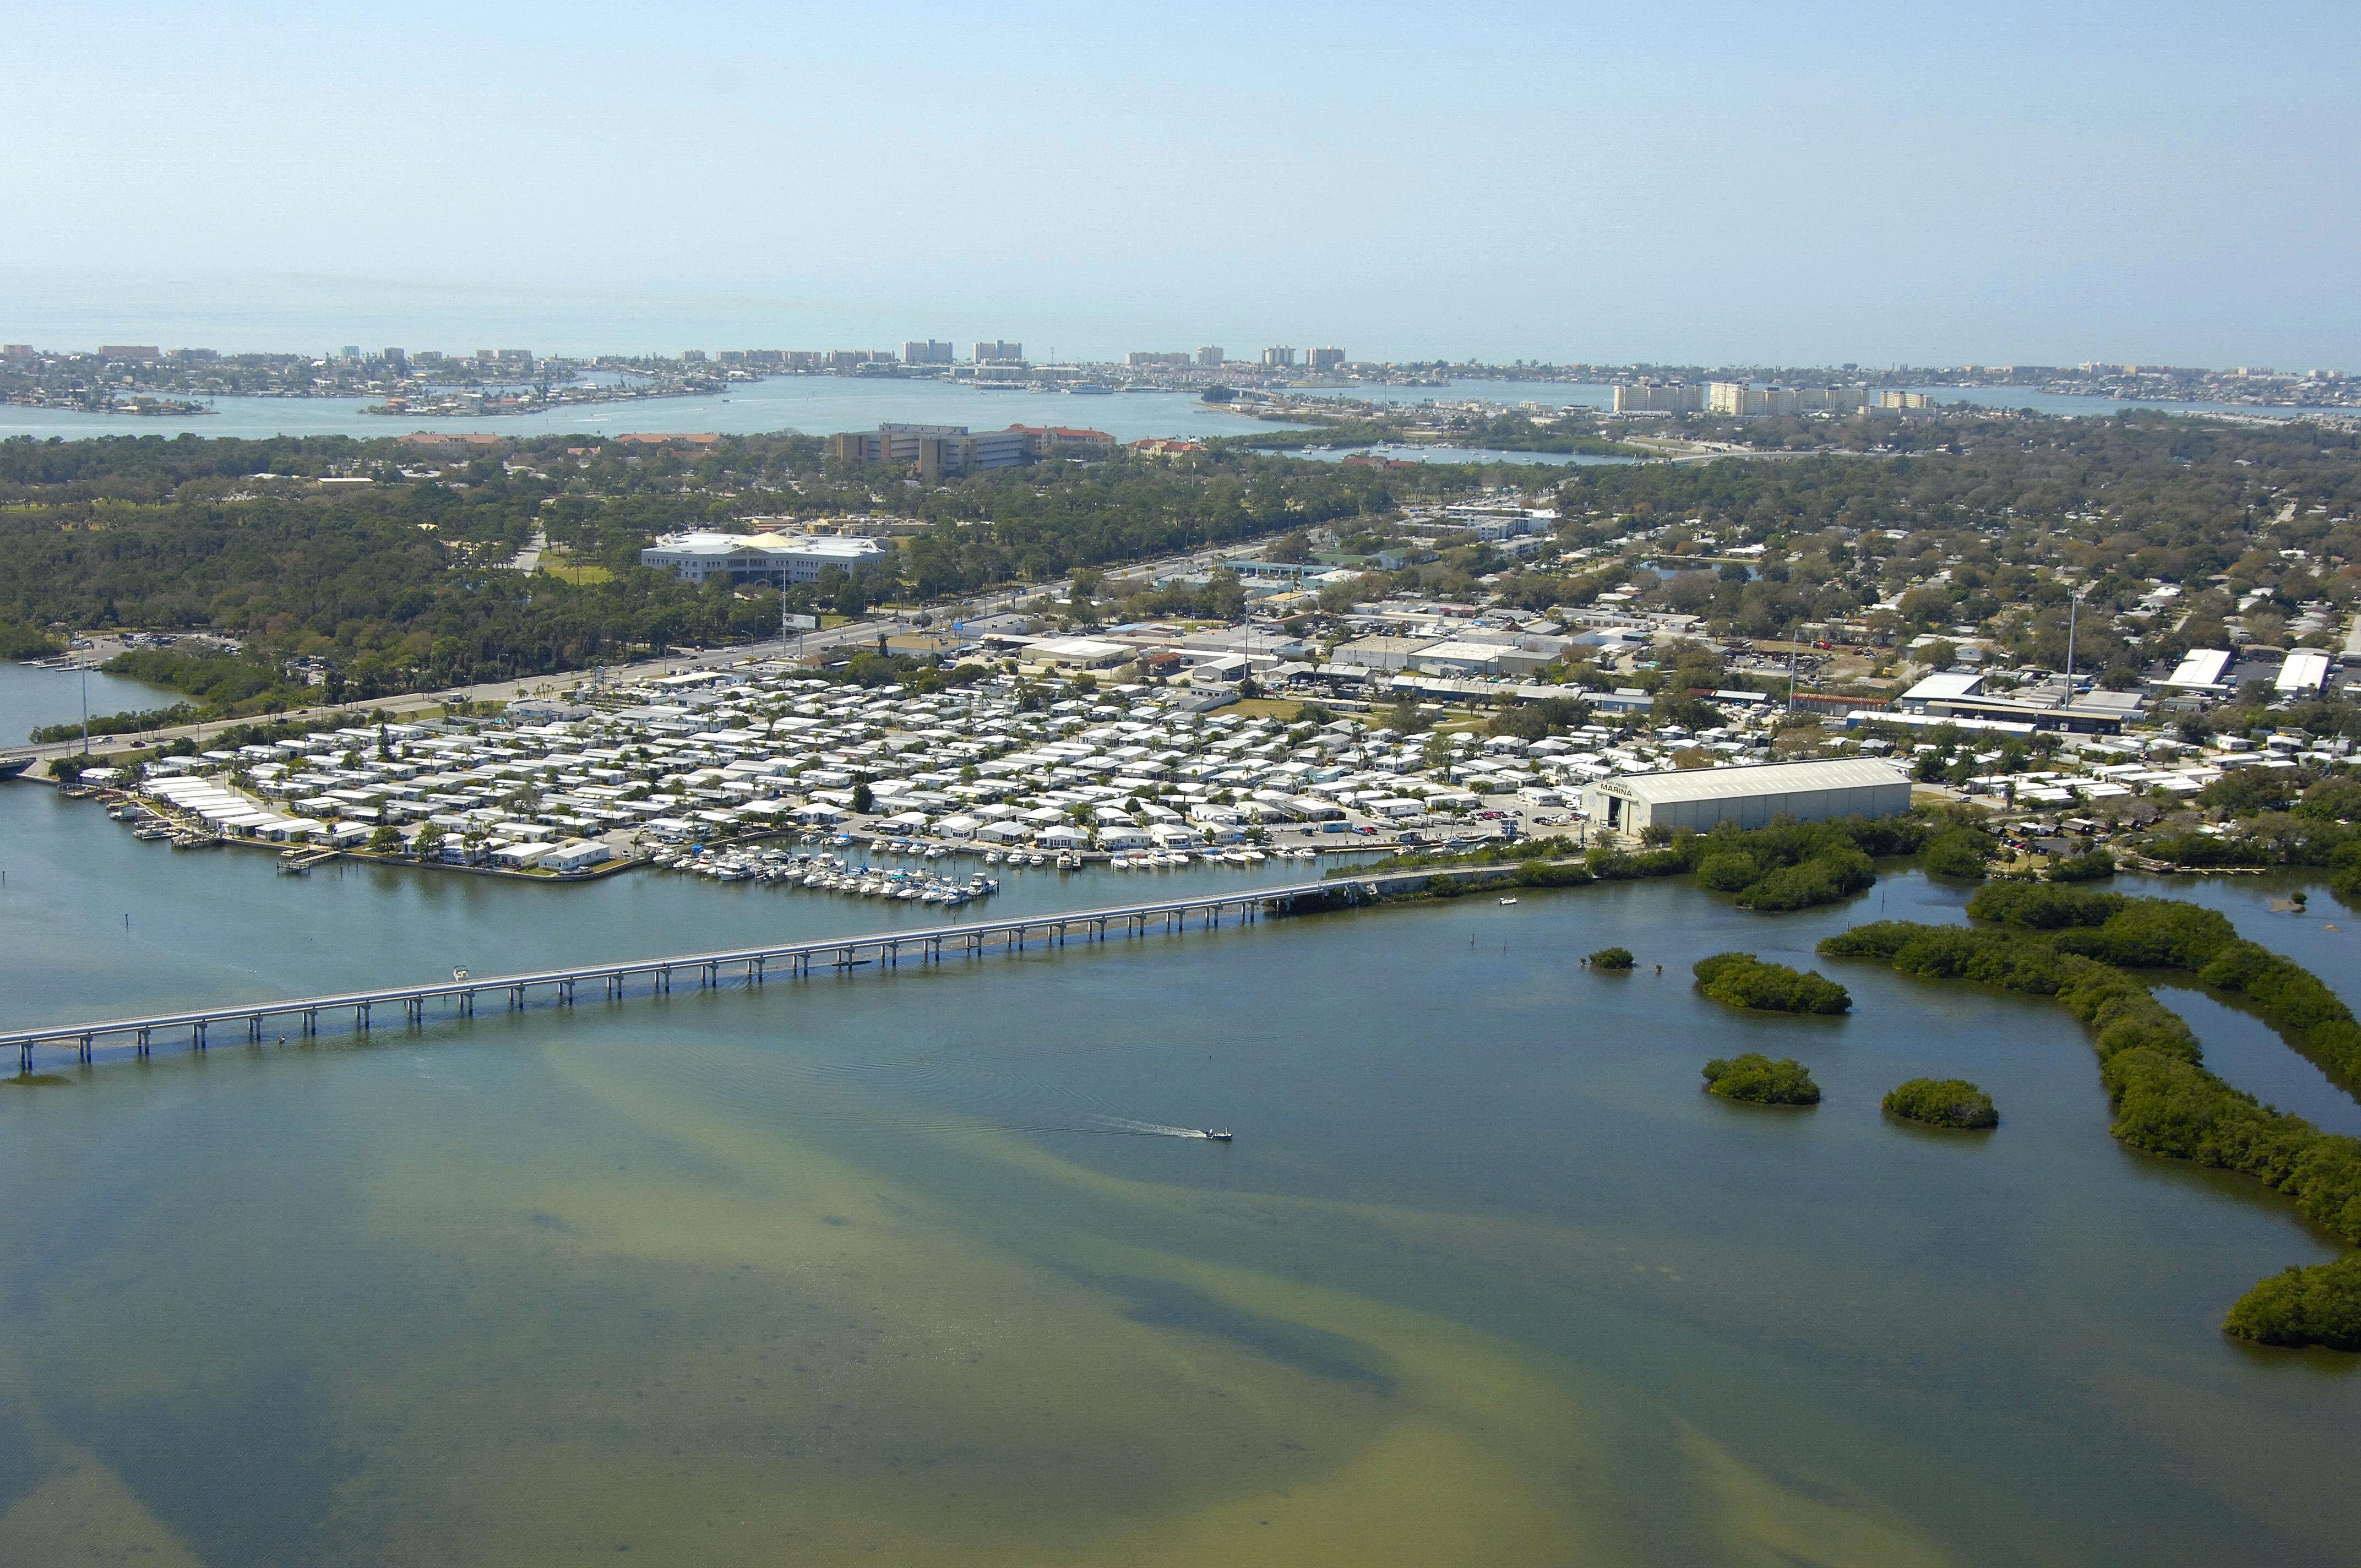 Bay Pines Marina In St Petersburg Fl United States Marina Reviews Phone Number Marinas Com